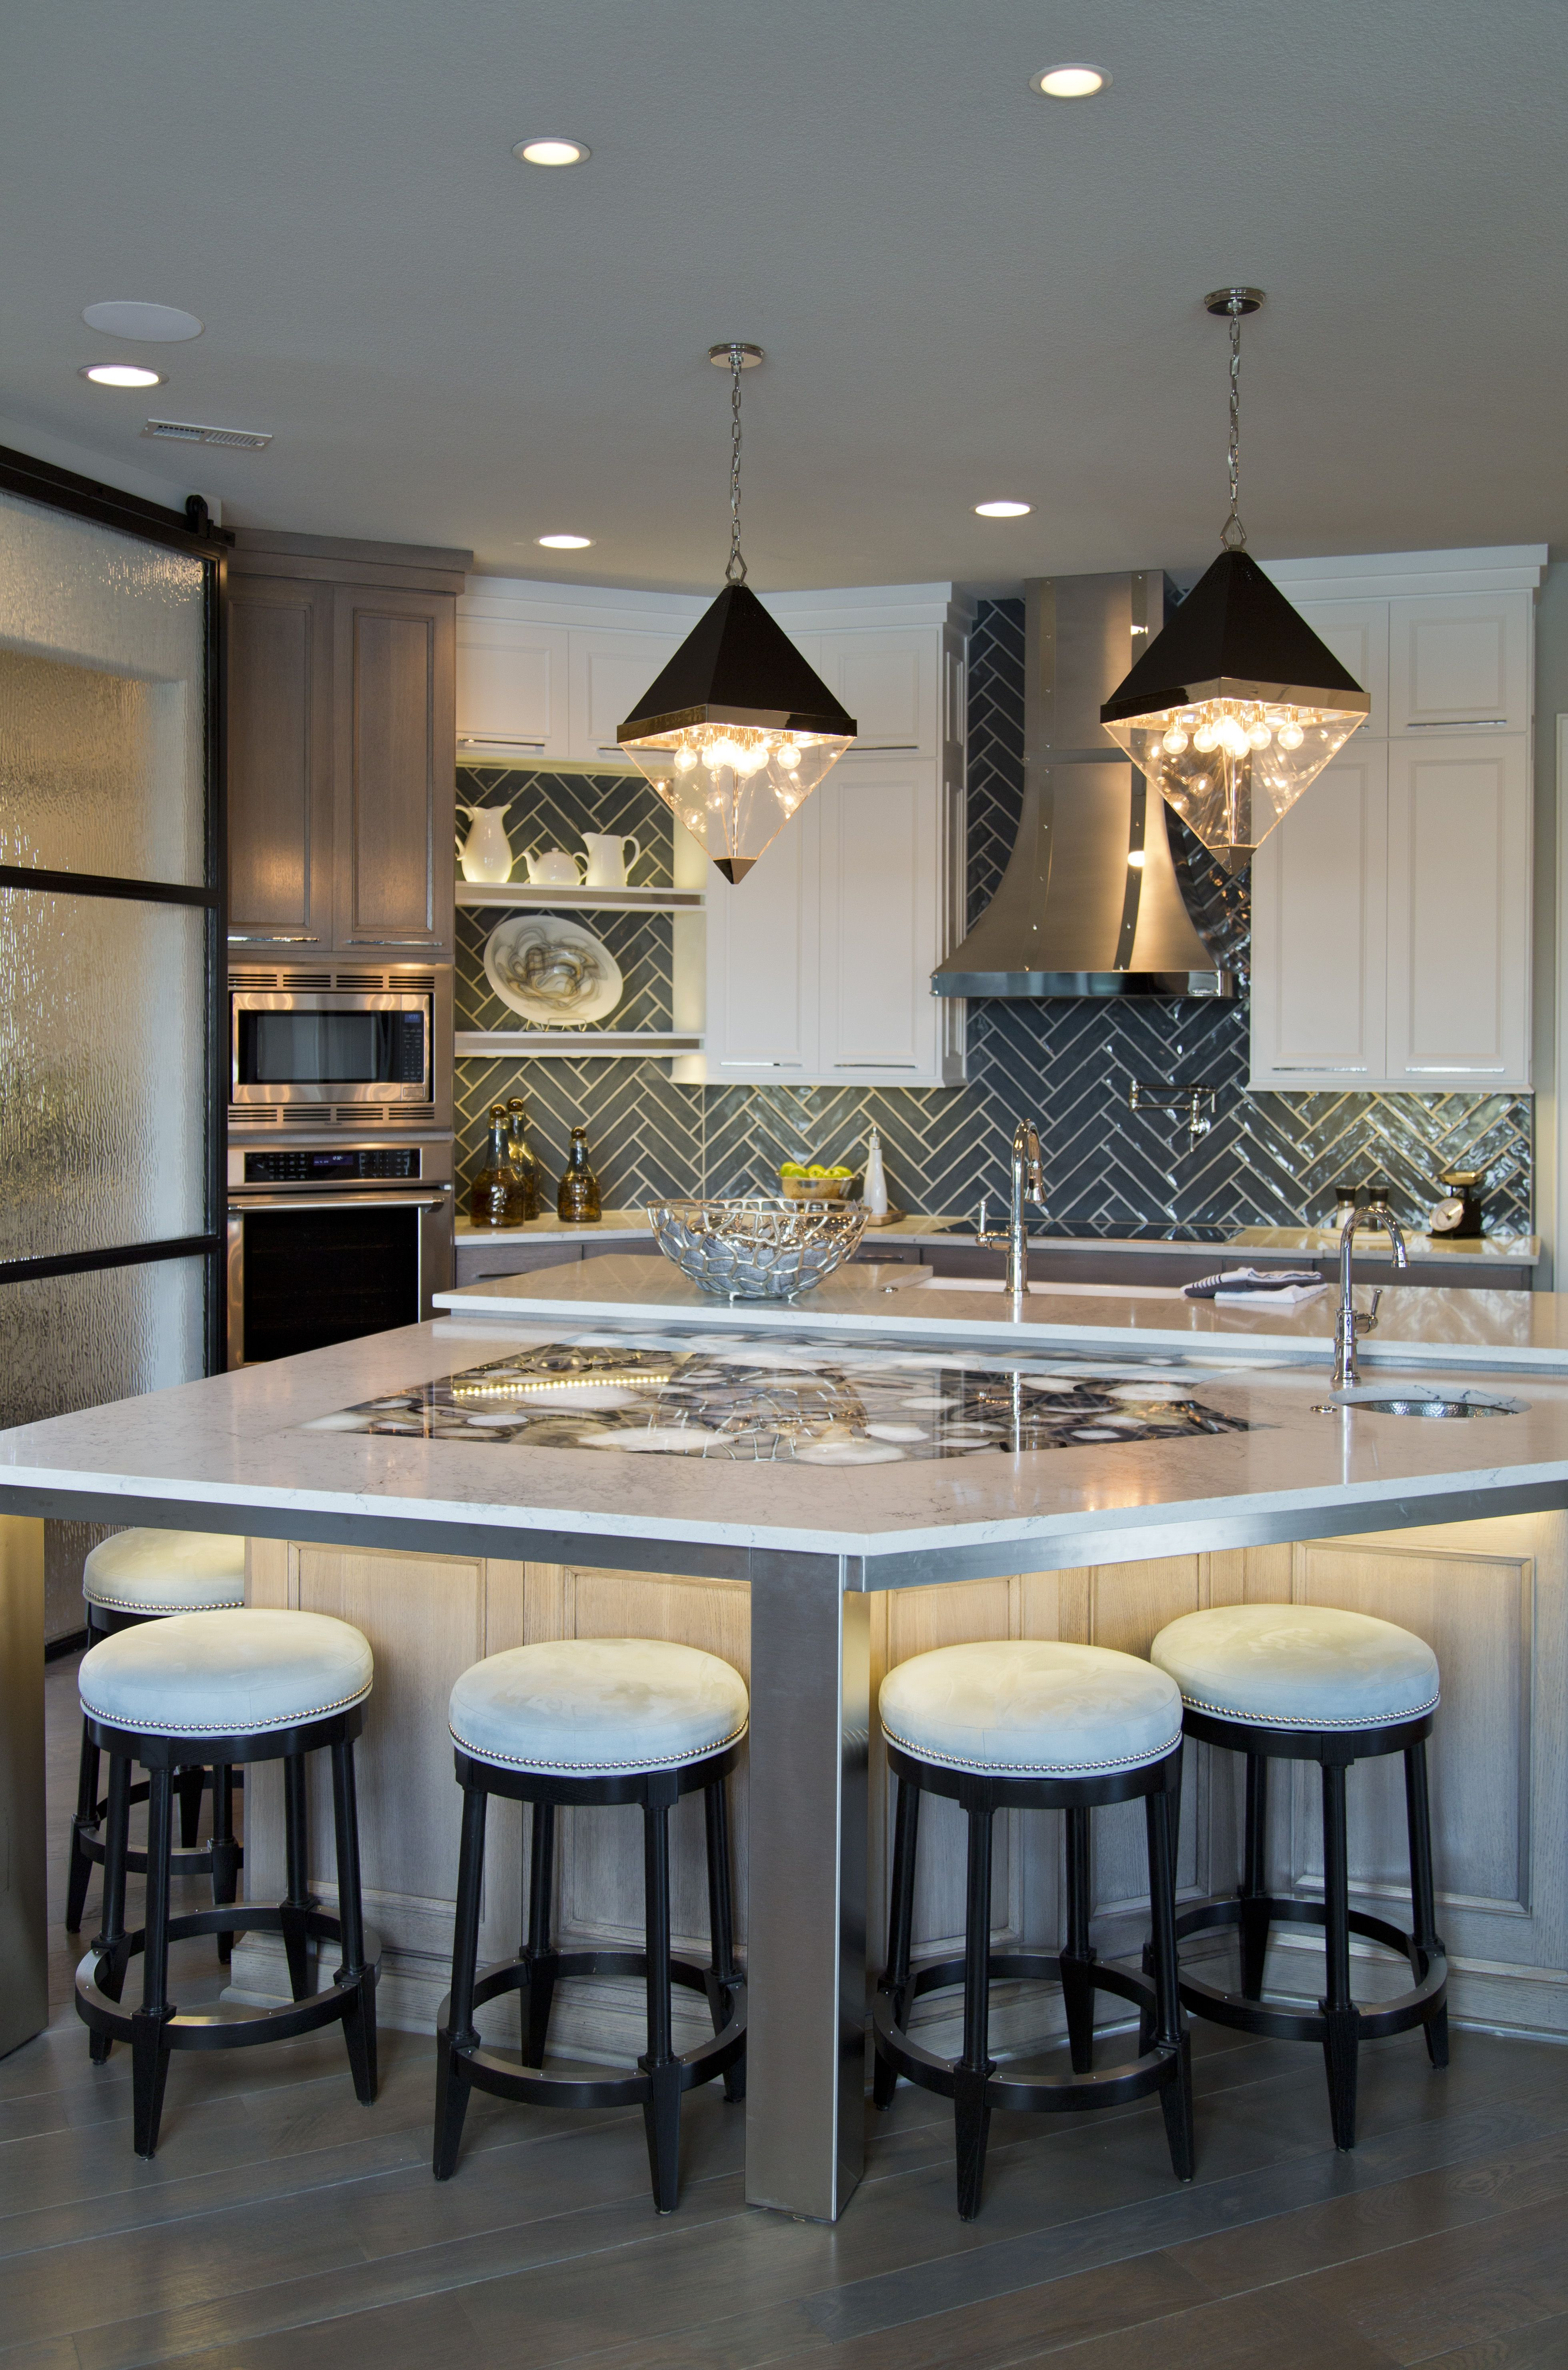 DREAM kitchen by Don Julian Builders. Diamond shaped ...